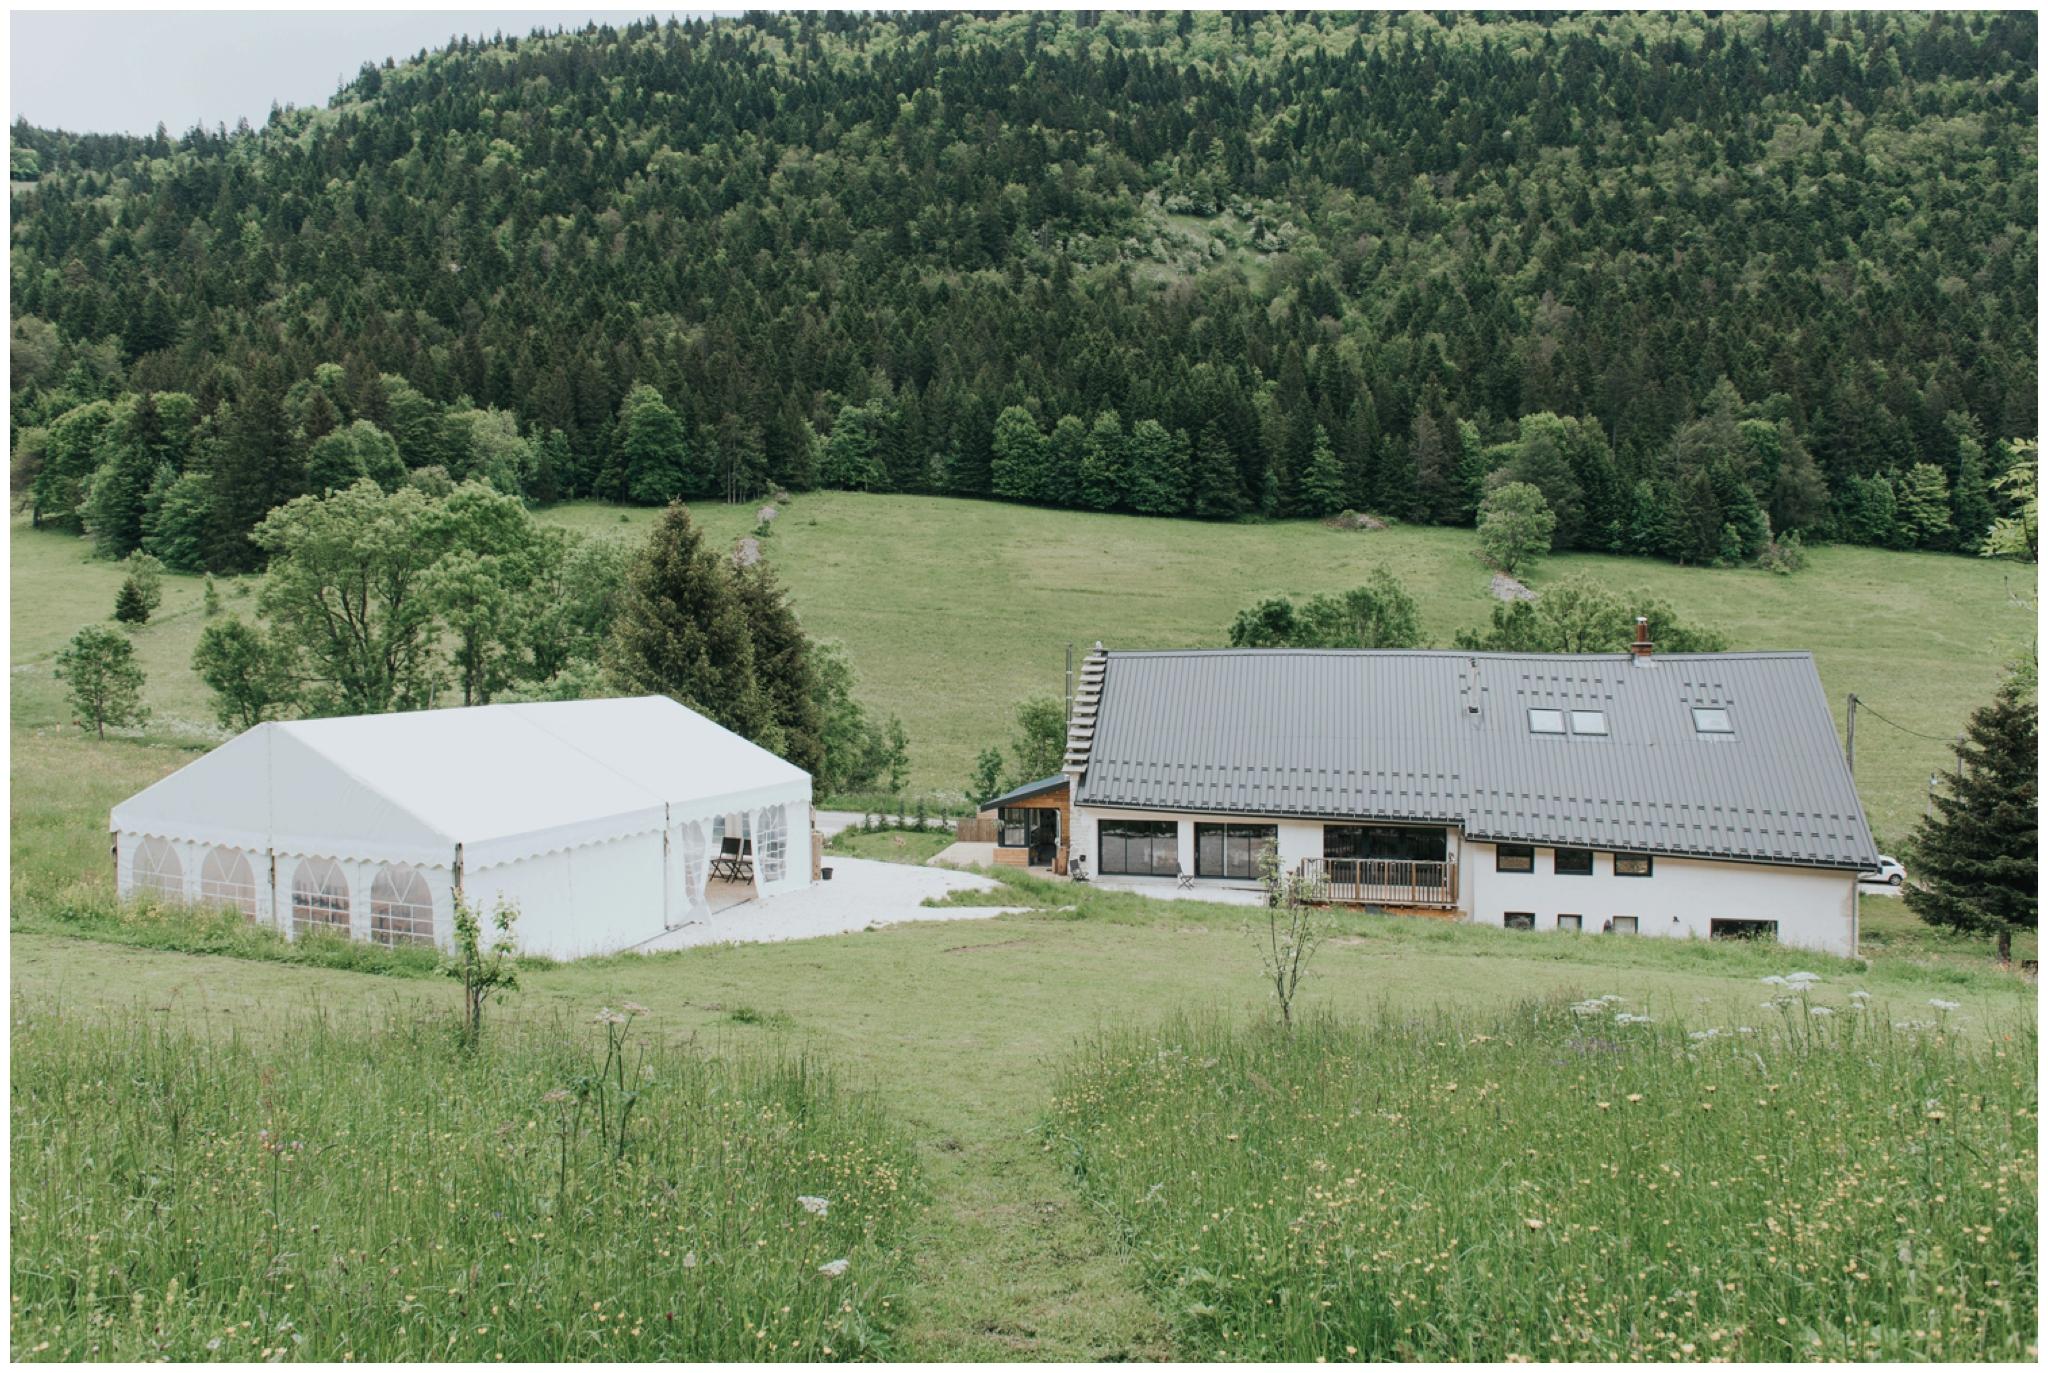 photographe-mariage-montagne-vercors-boho-folk-grenoble-annecy-alpes_0001